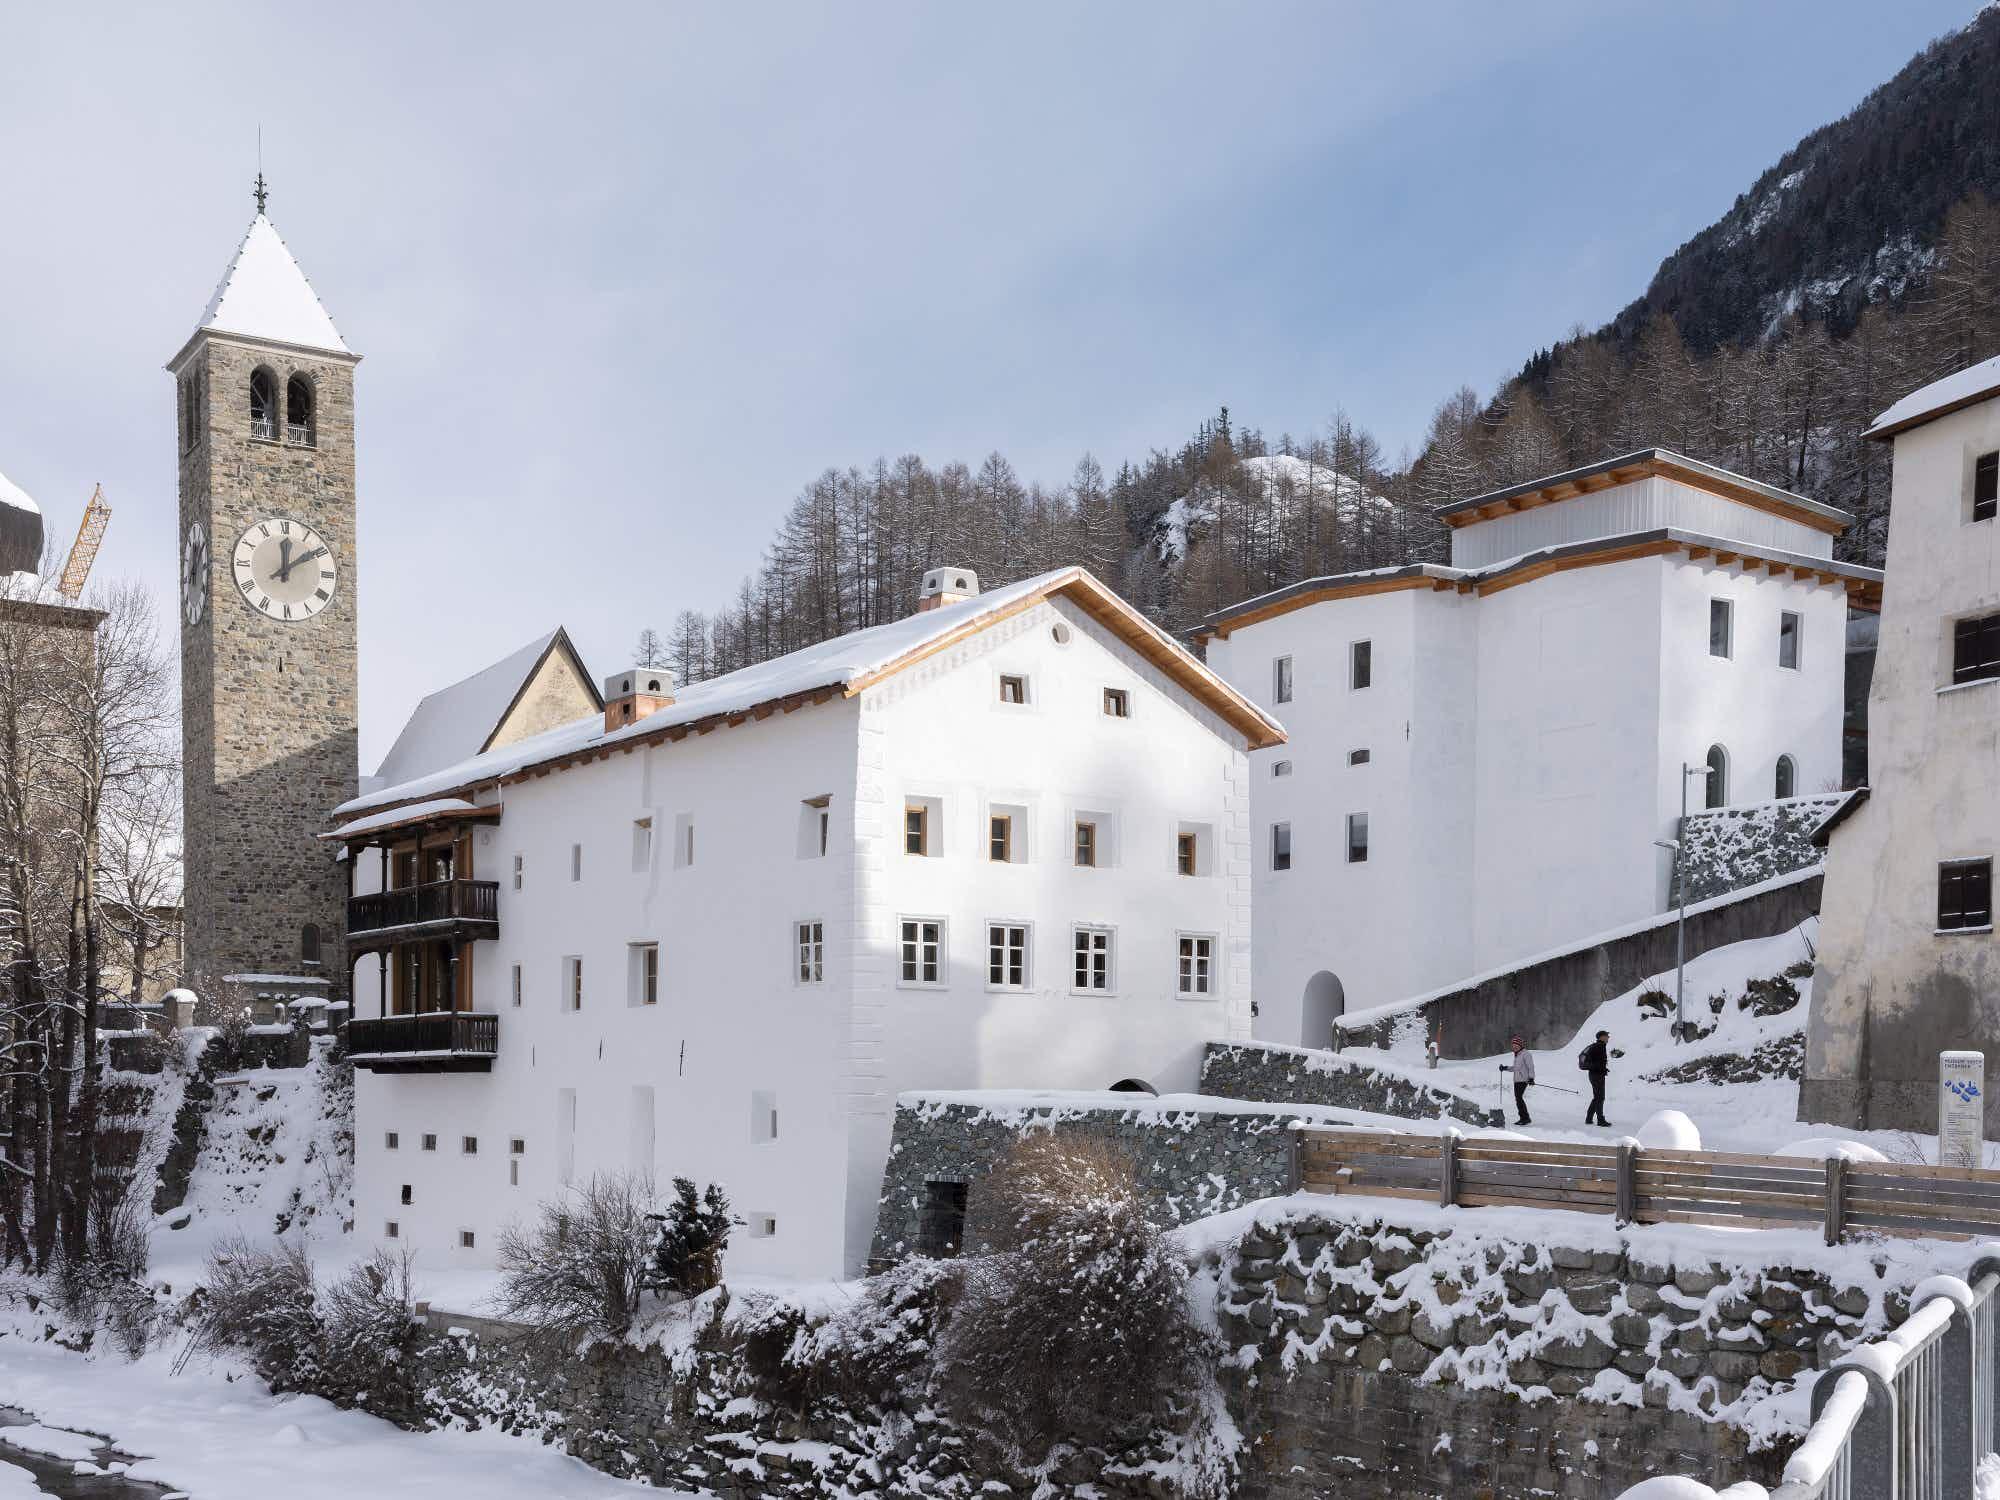 Inside Switzerland's most unique art space beneath the Alps